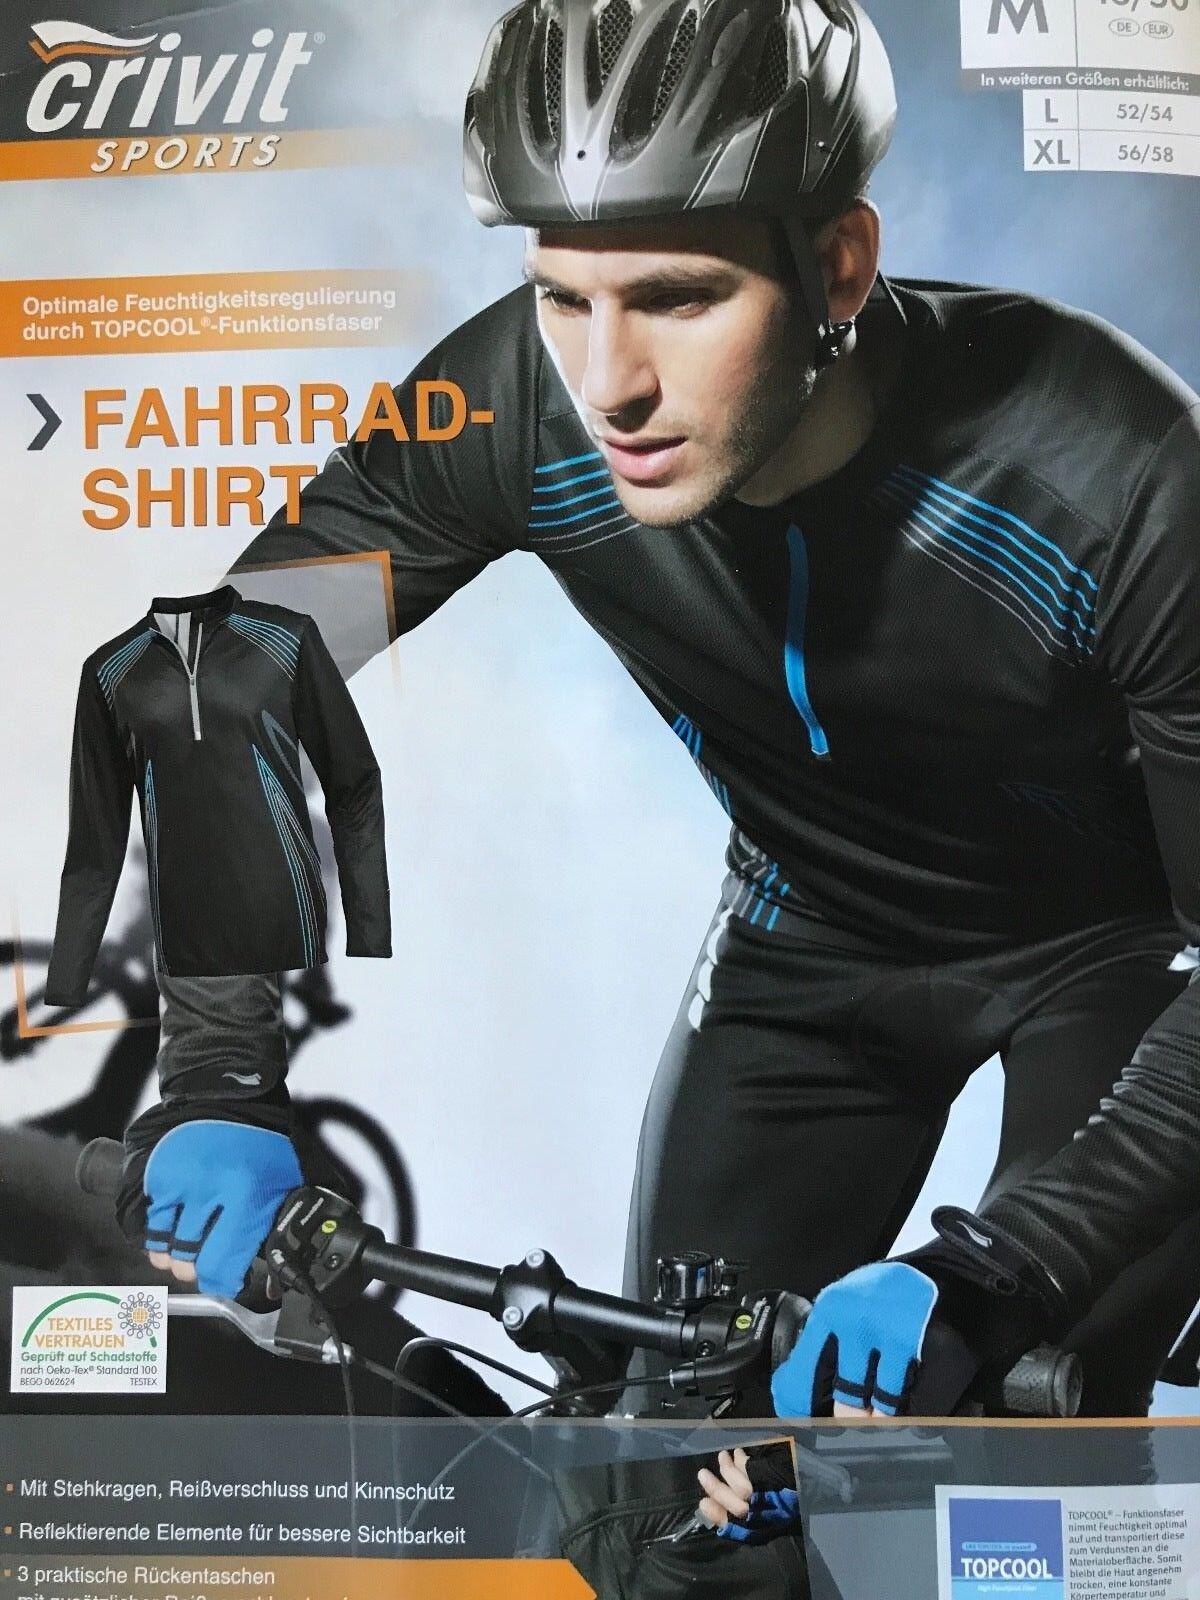 Details about Original CRIVIT® Bike Men s Cycling Jersey Long Sleeve T-Shirt  TOPCOOL® Fabric a4bc32c64